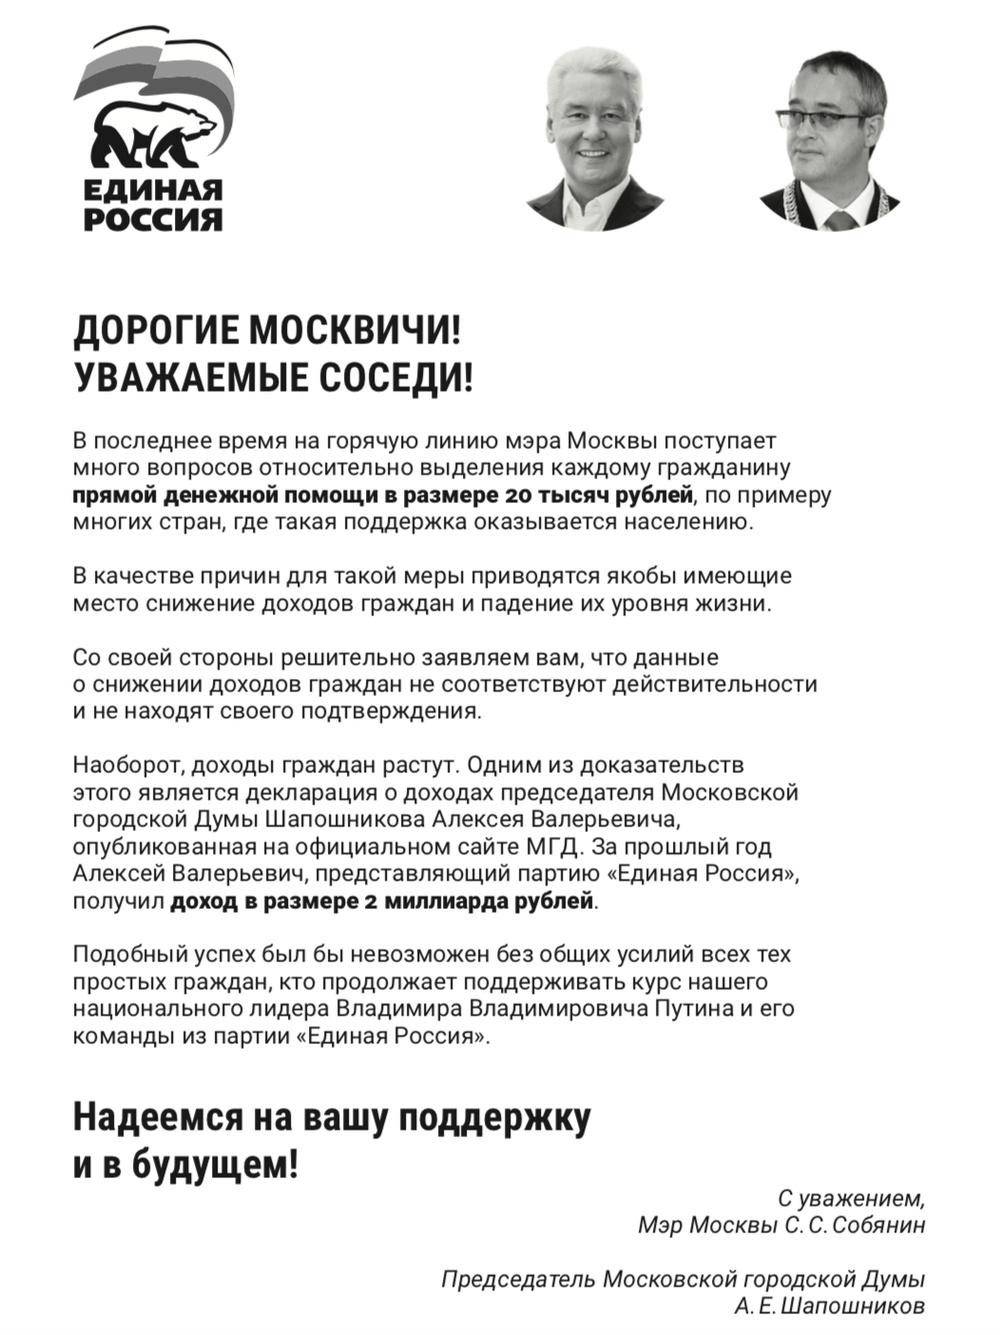 https://st.navalny.com/media/cache/91/3f/913f49d8b6a457bbf1eb3581b5e74afa.jpg